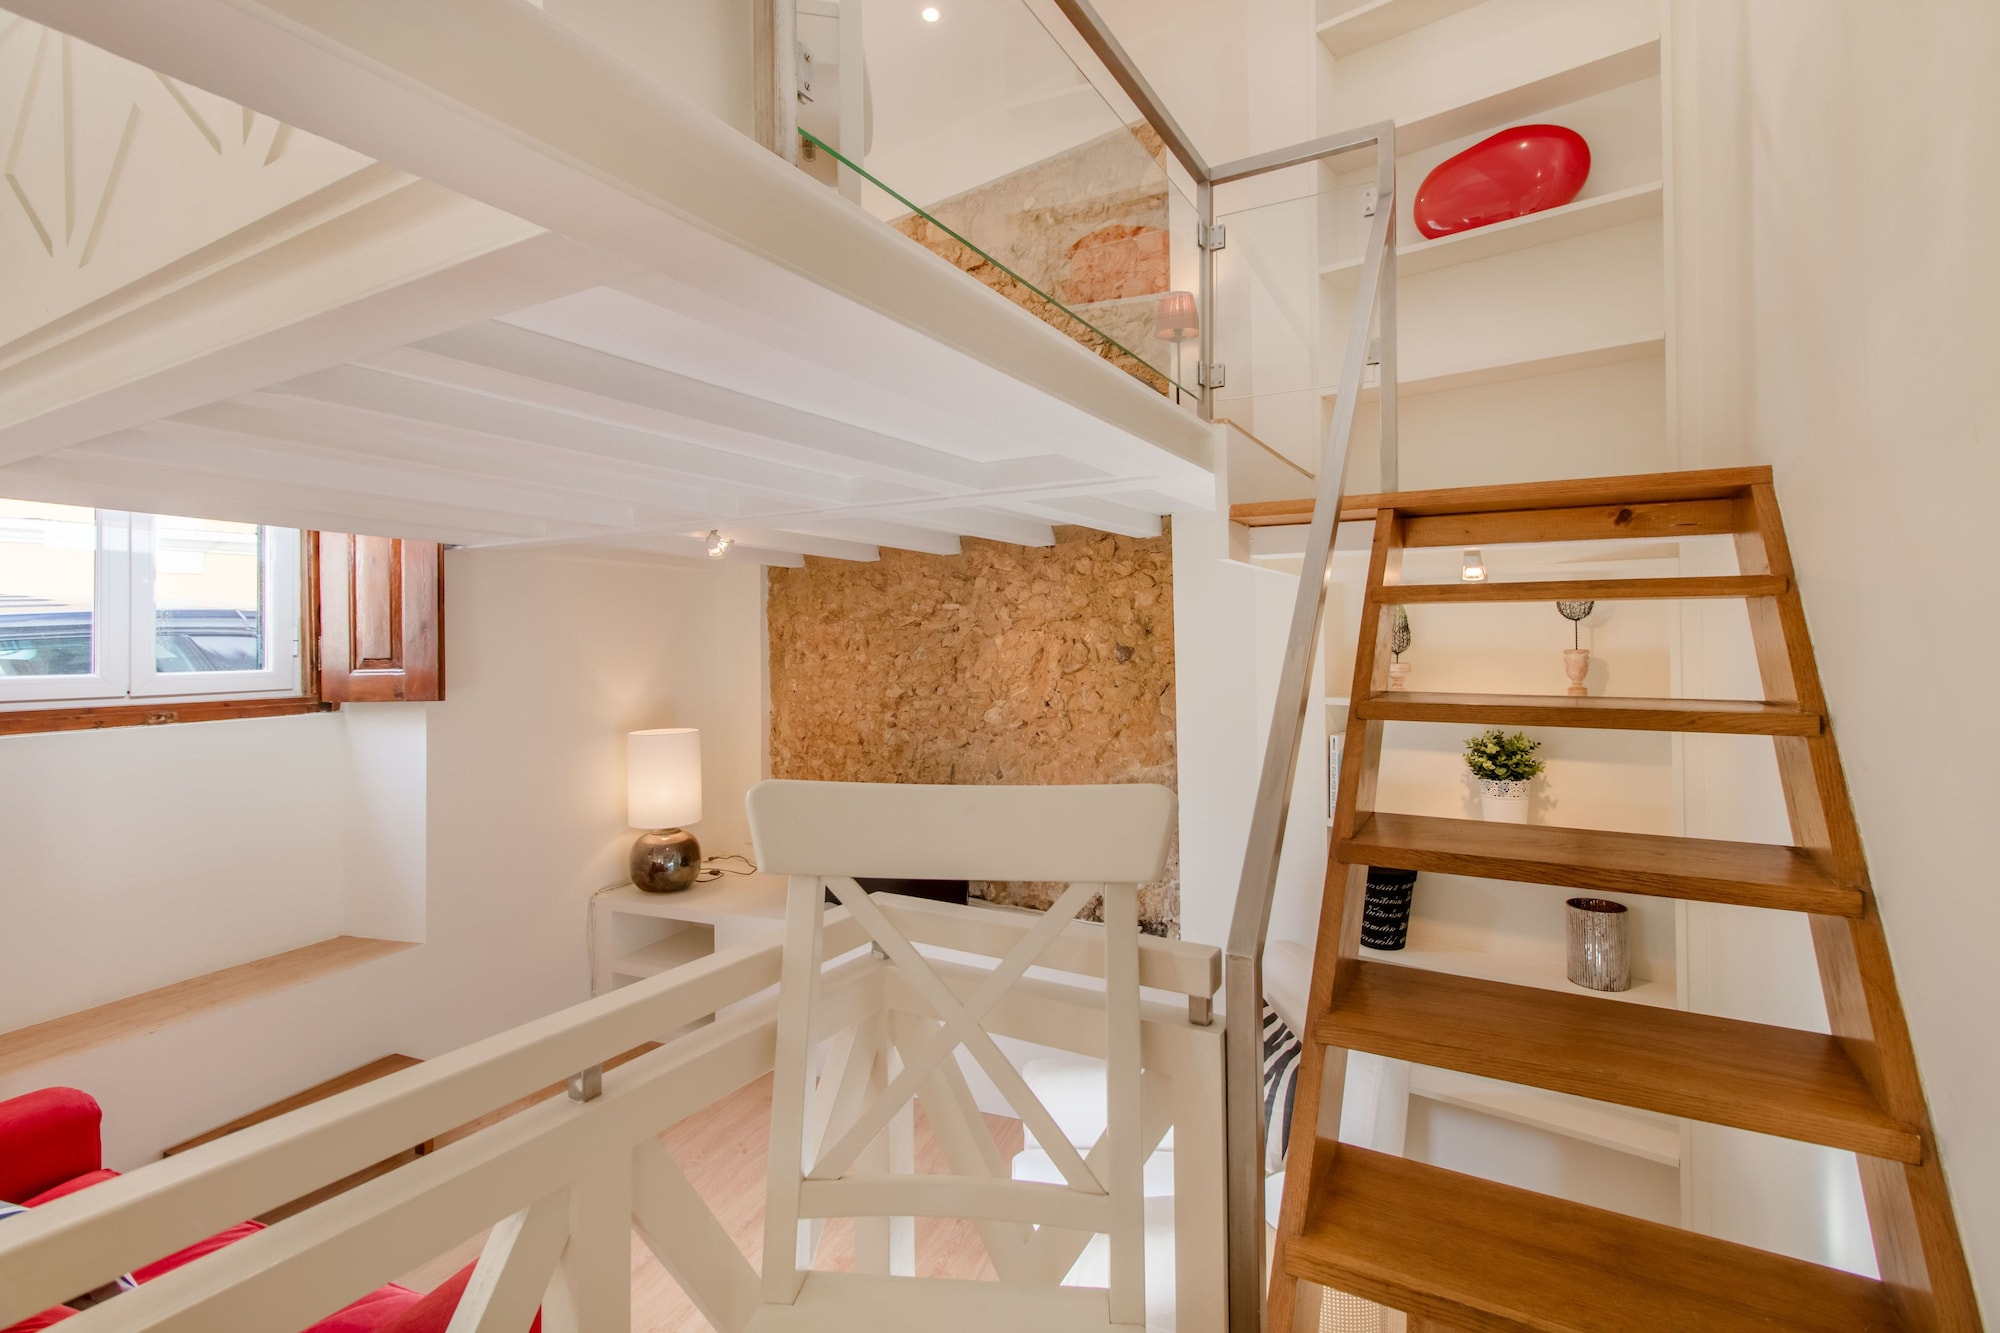 Lapa Cozy Flat With Mezzanine, Lisboa